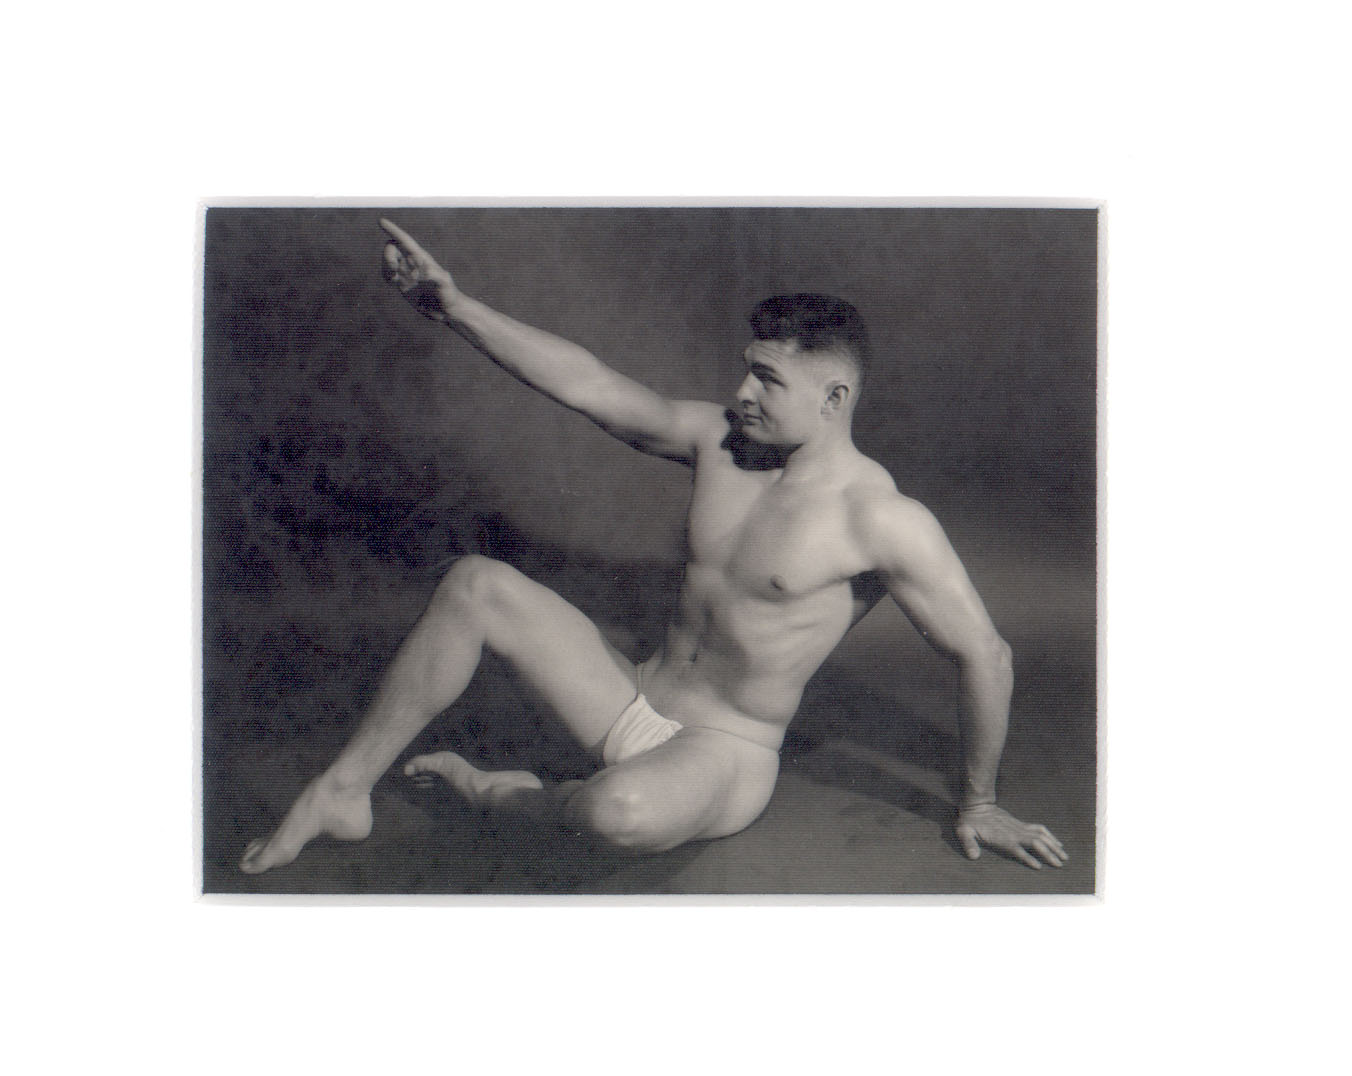 Erotic art gallery los angeles